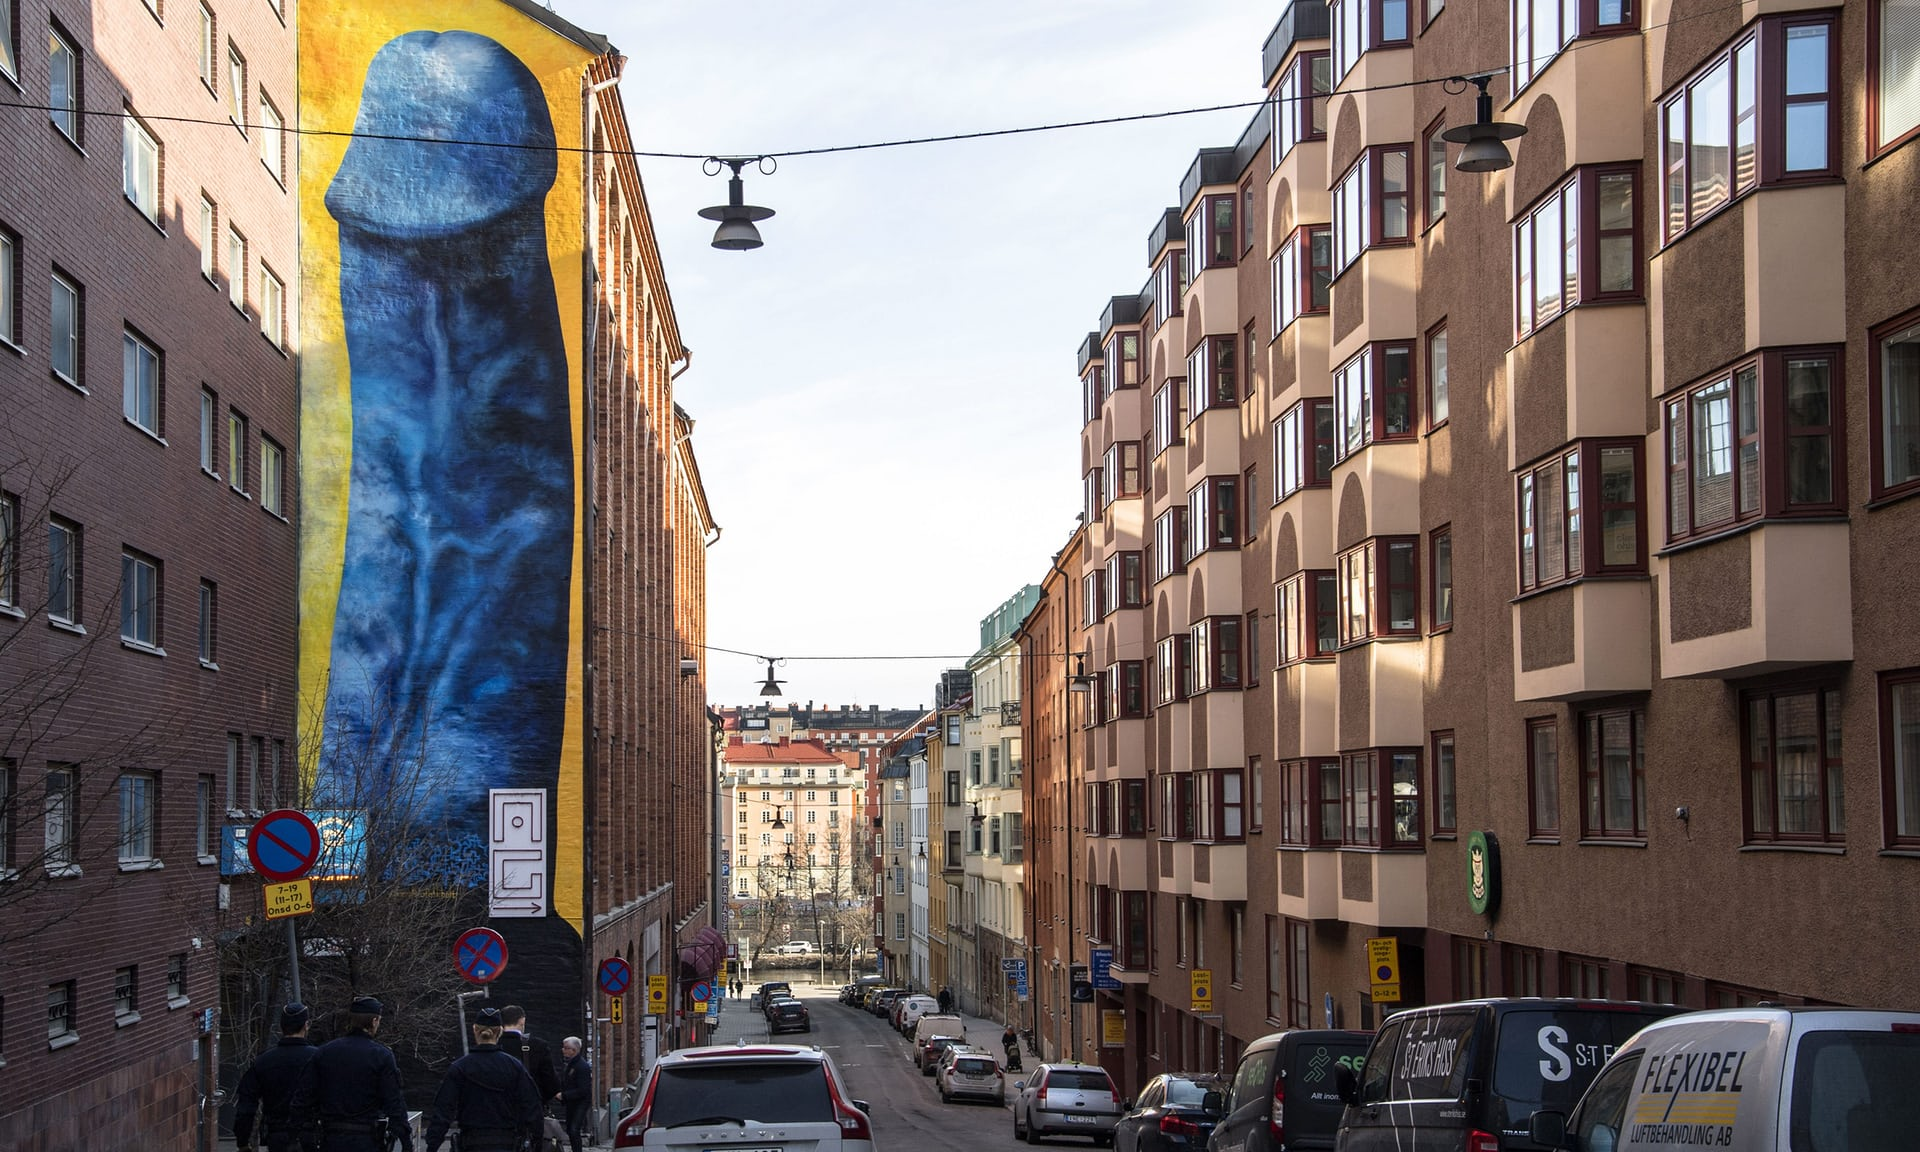 Мурал із зображенням пеніса у Стокгольмі